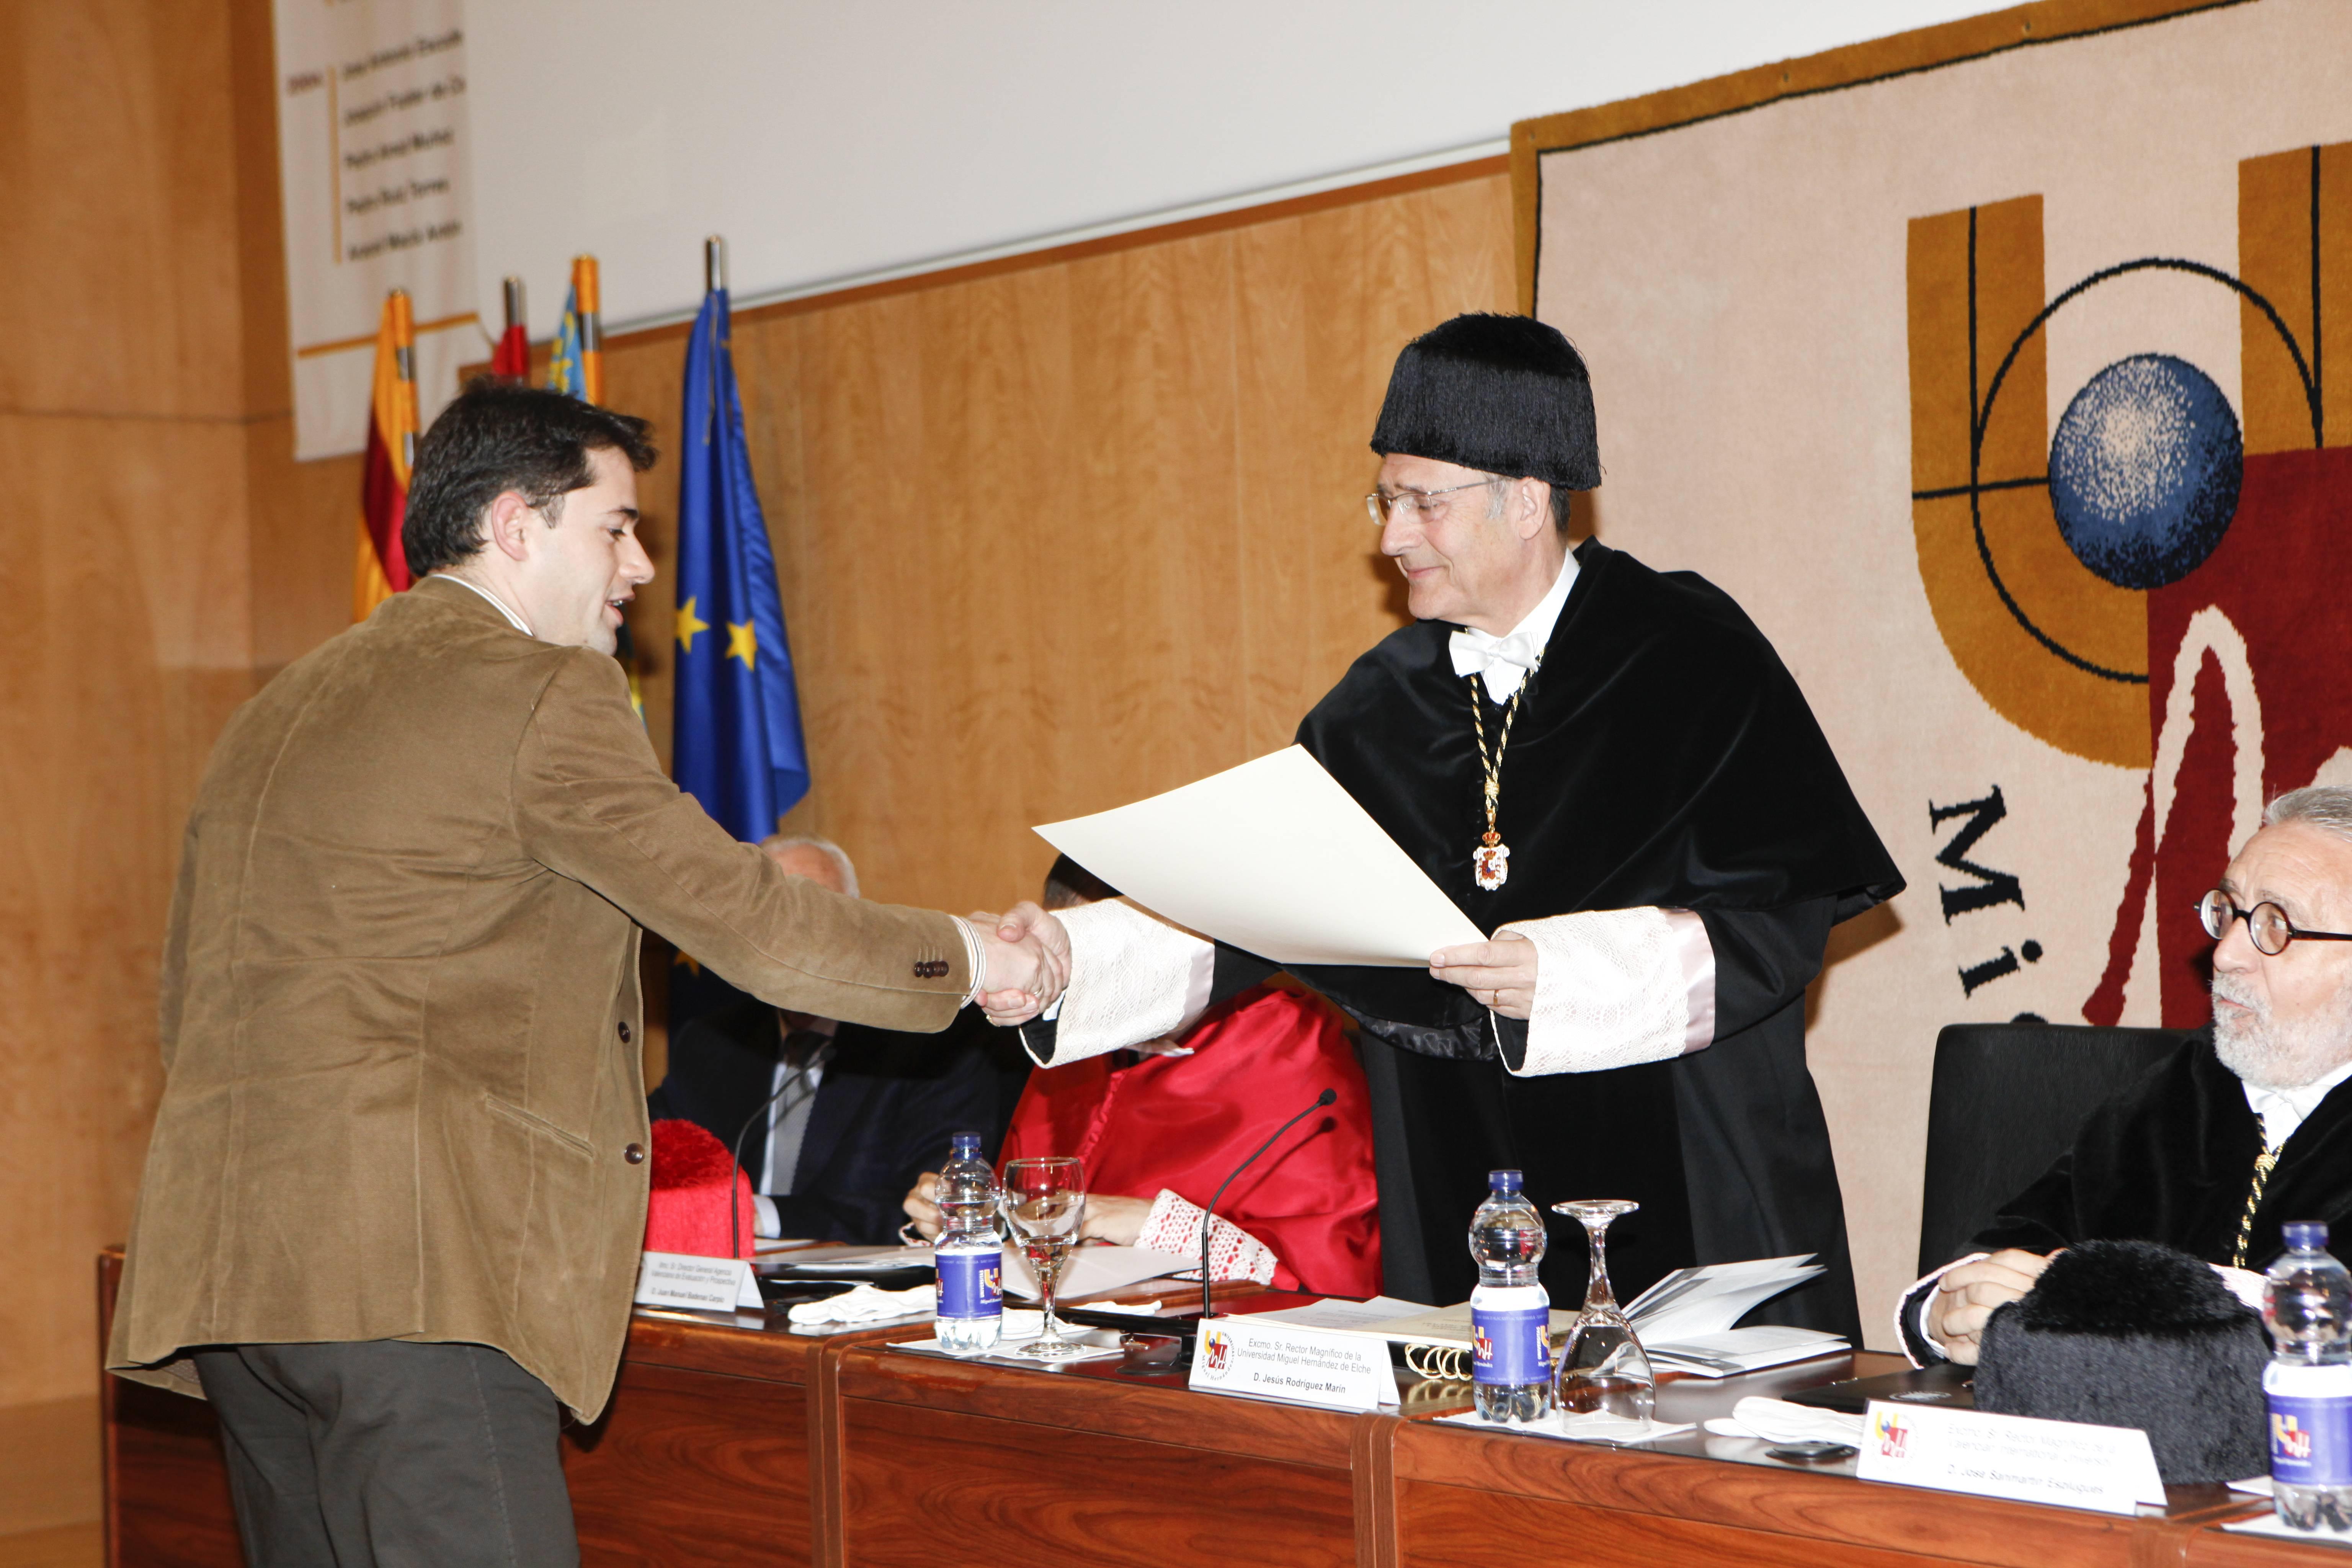 doctor-honoris-causa-luis-gamir_mg_0899.jpg